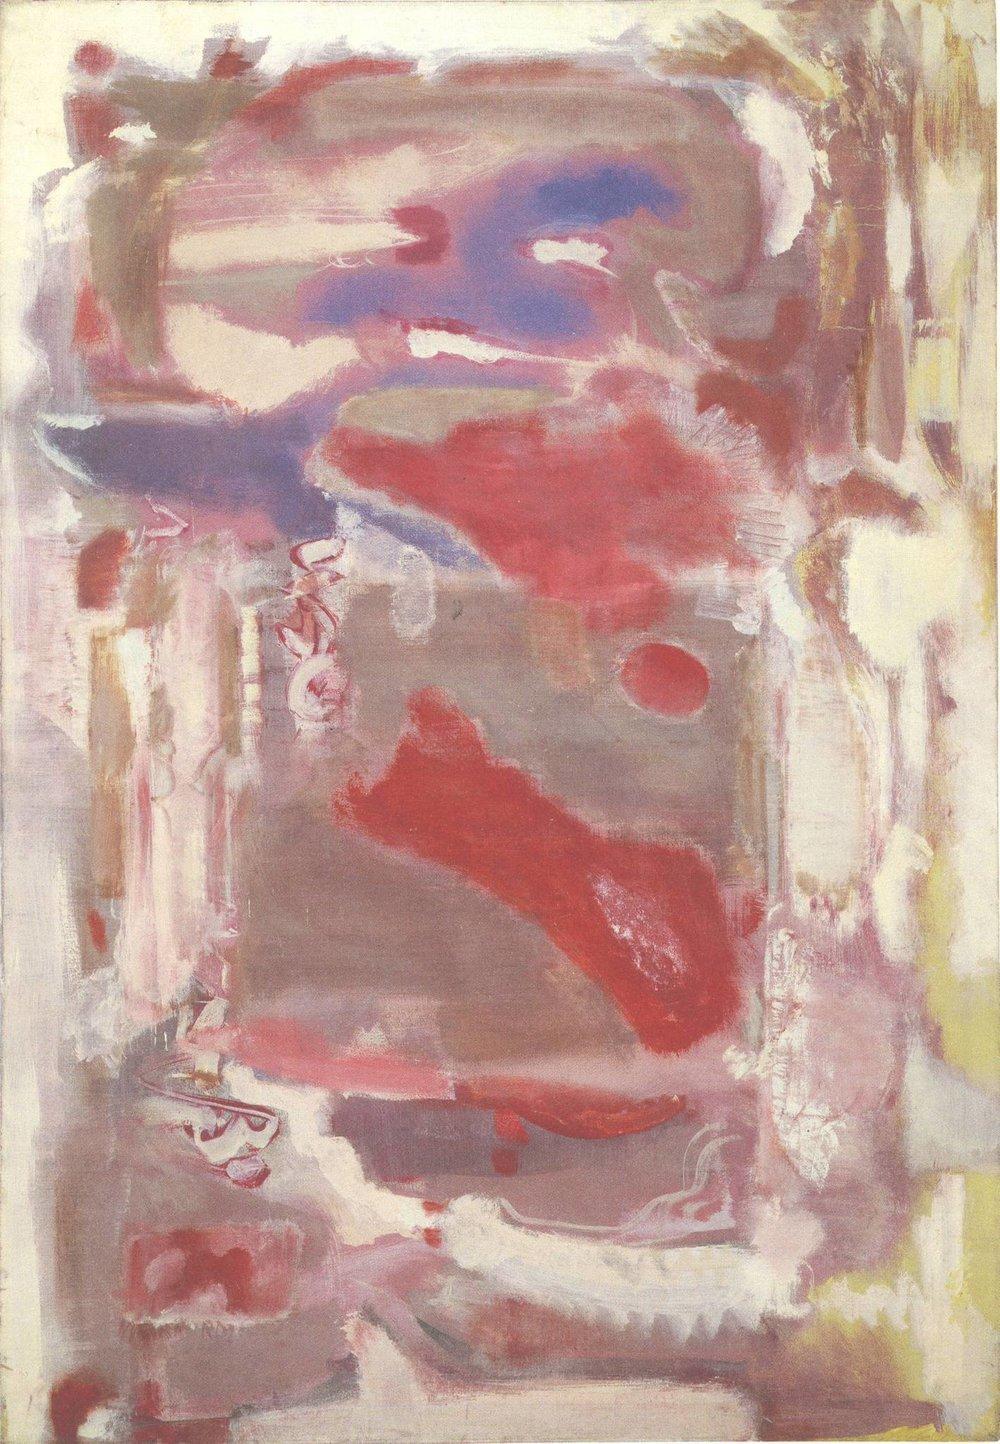 No. 18,  Mark Rothko, 1946, oil on canvas, 155 x 110 cm